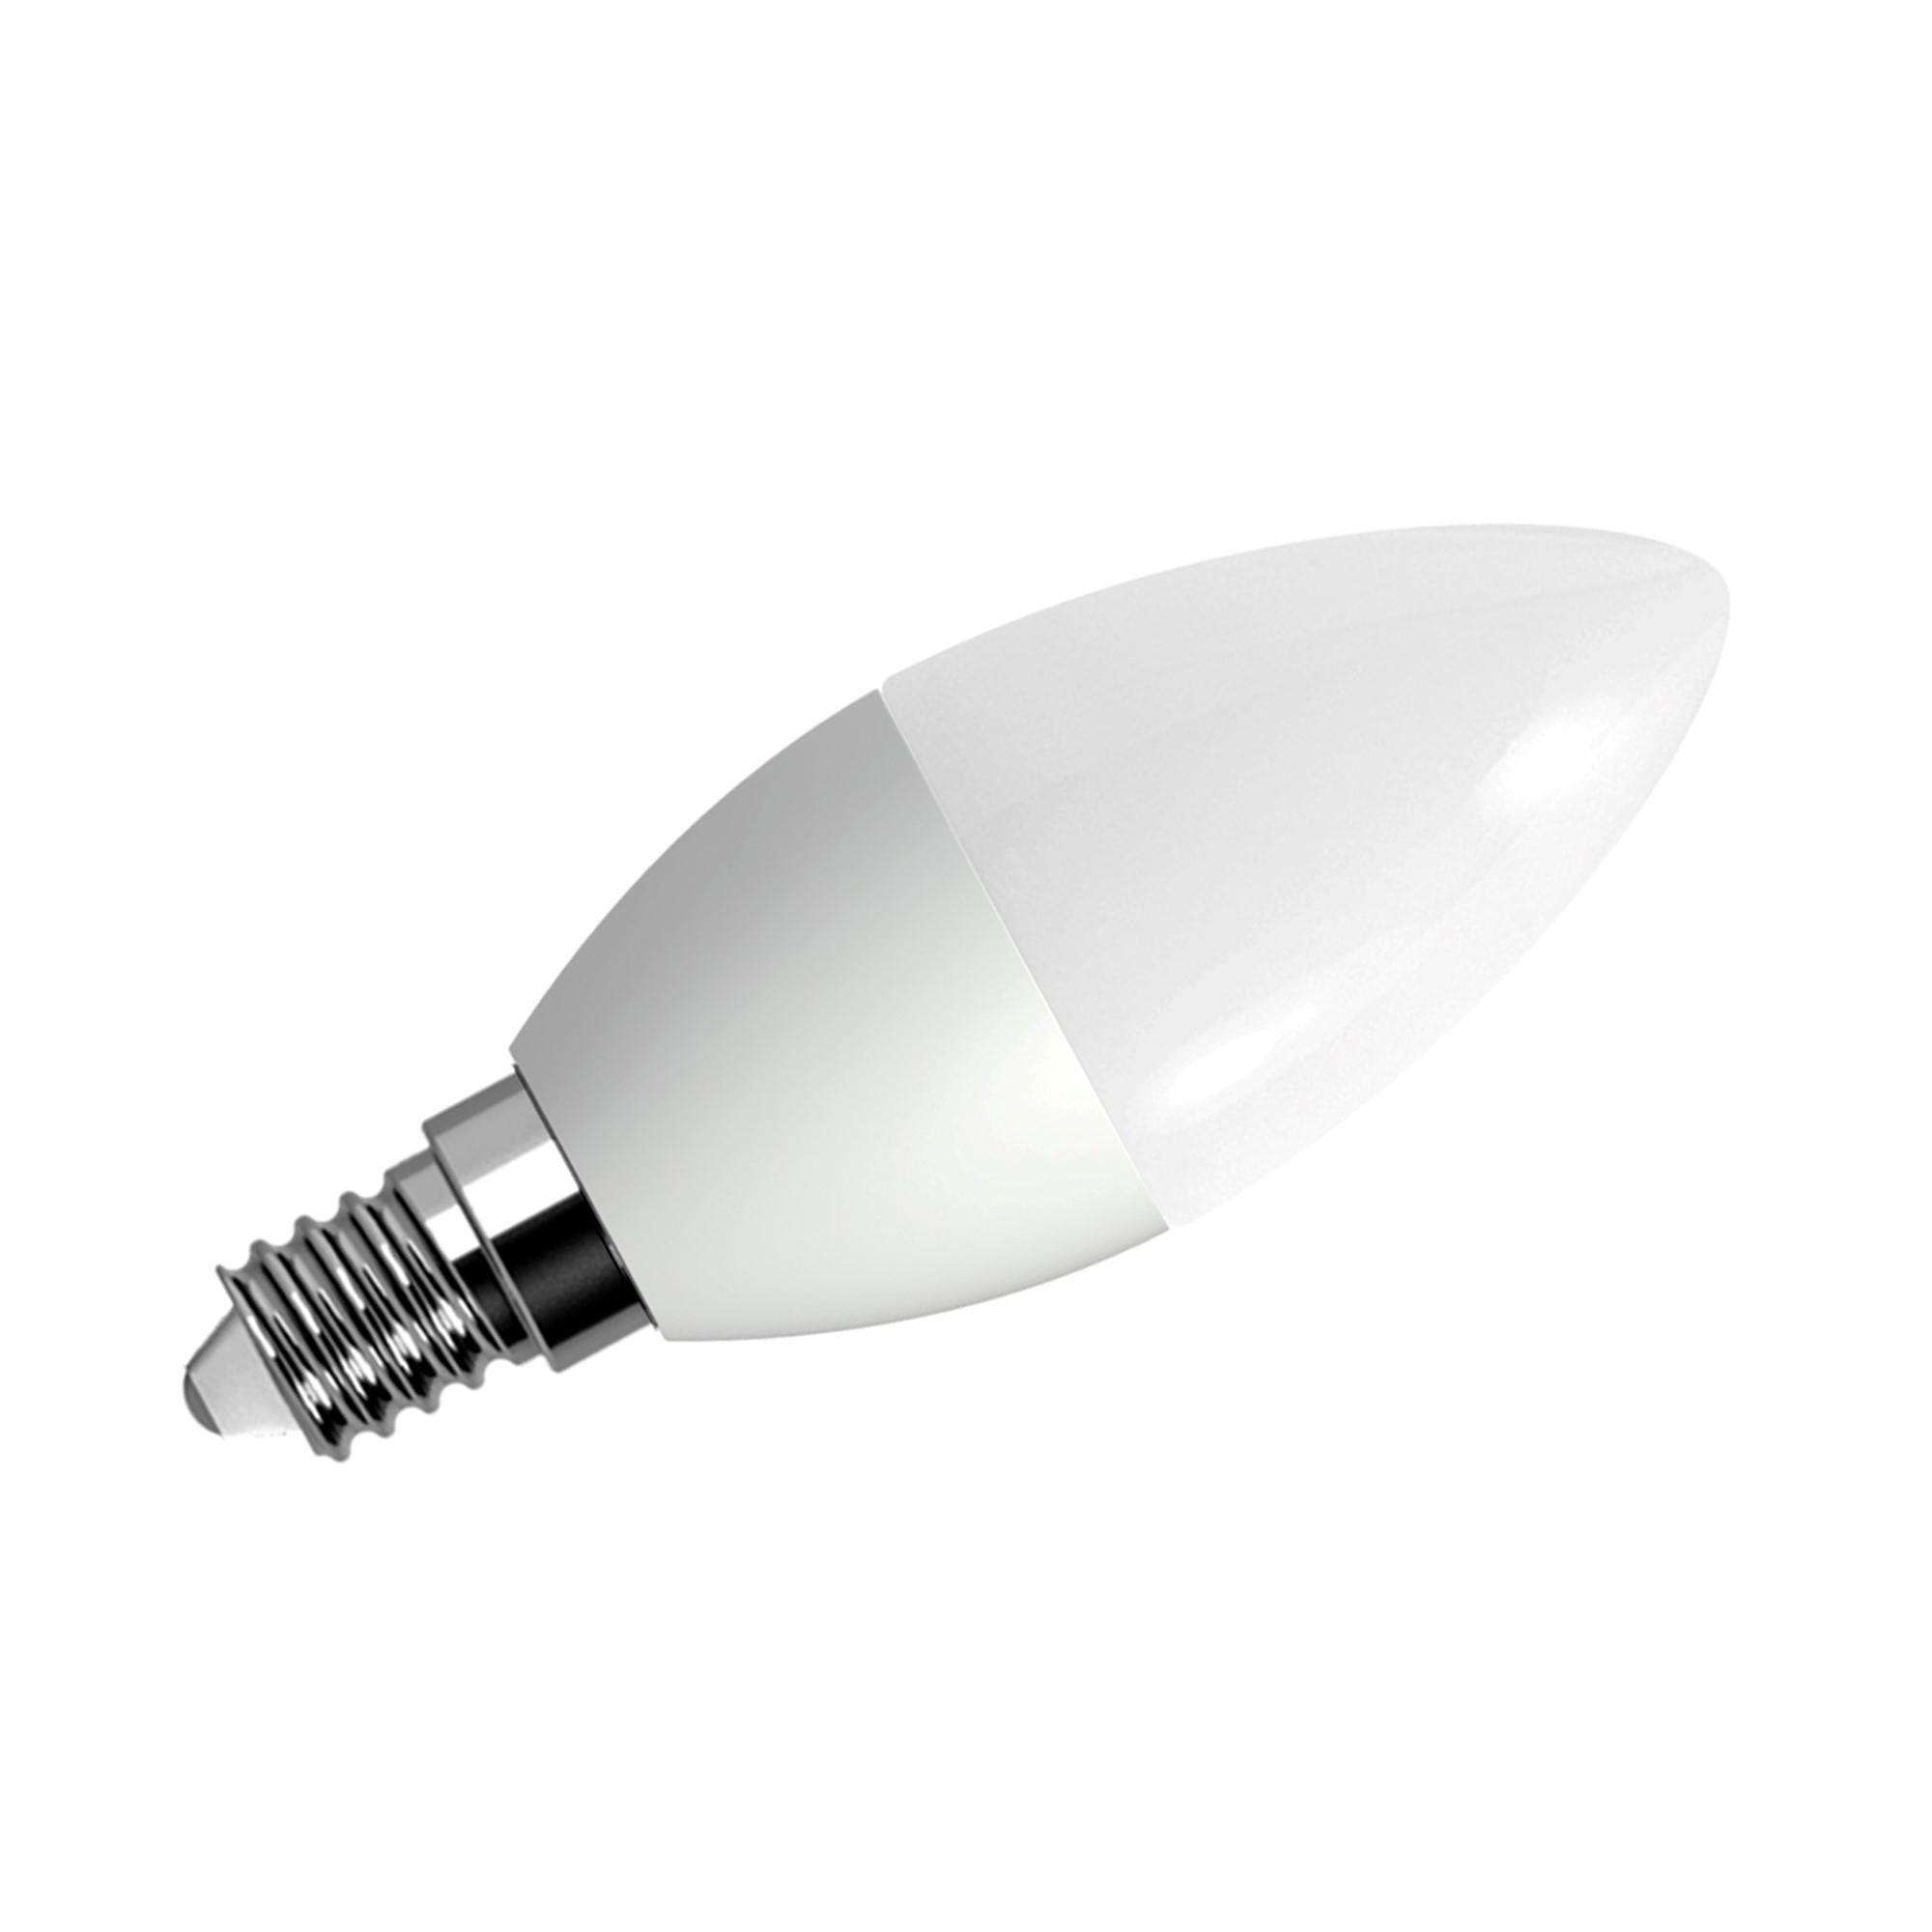 Ultron 163730 - 3,5 W - E14 - A+ - 250 lm - 25000 h - Warmweiß